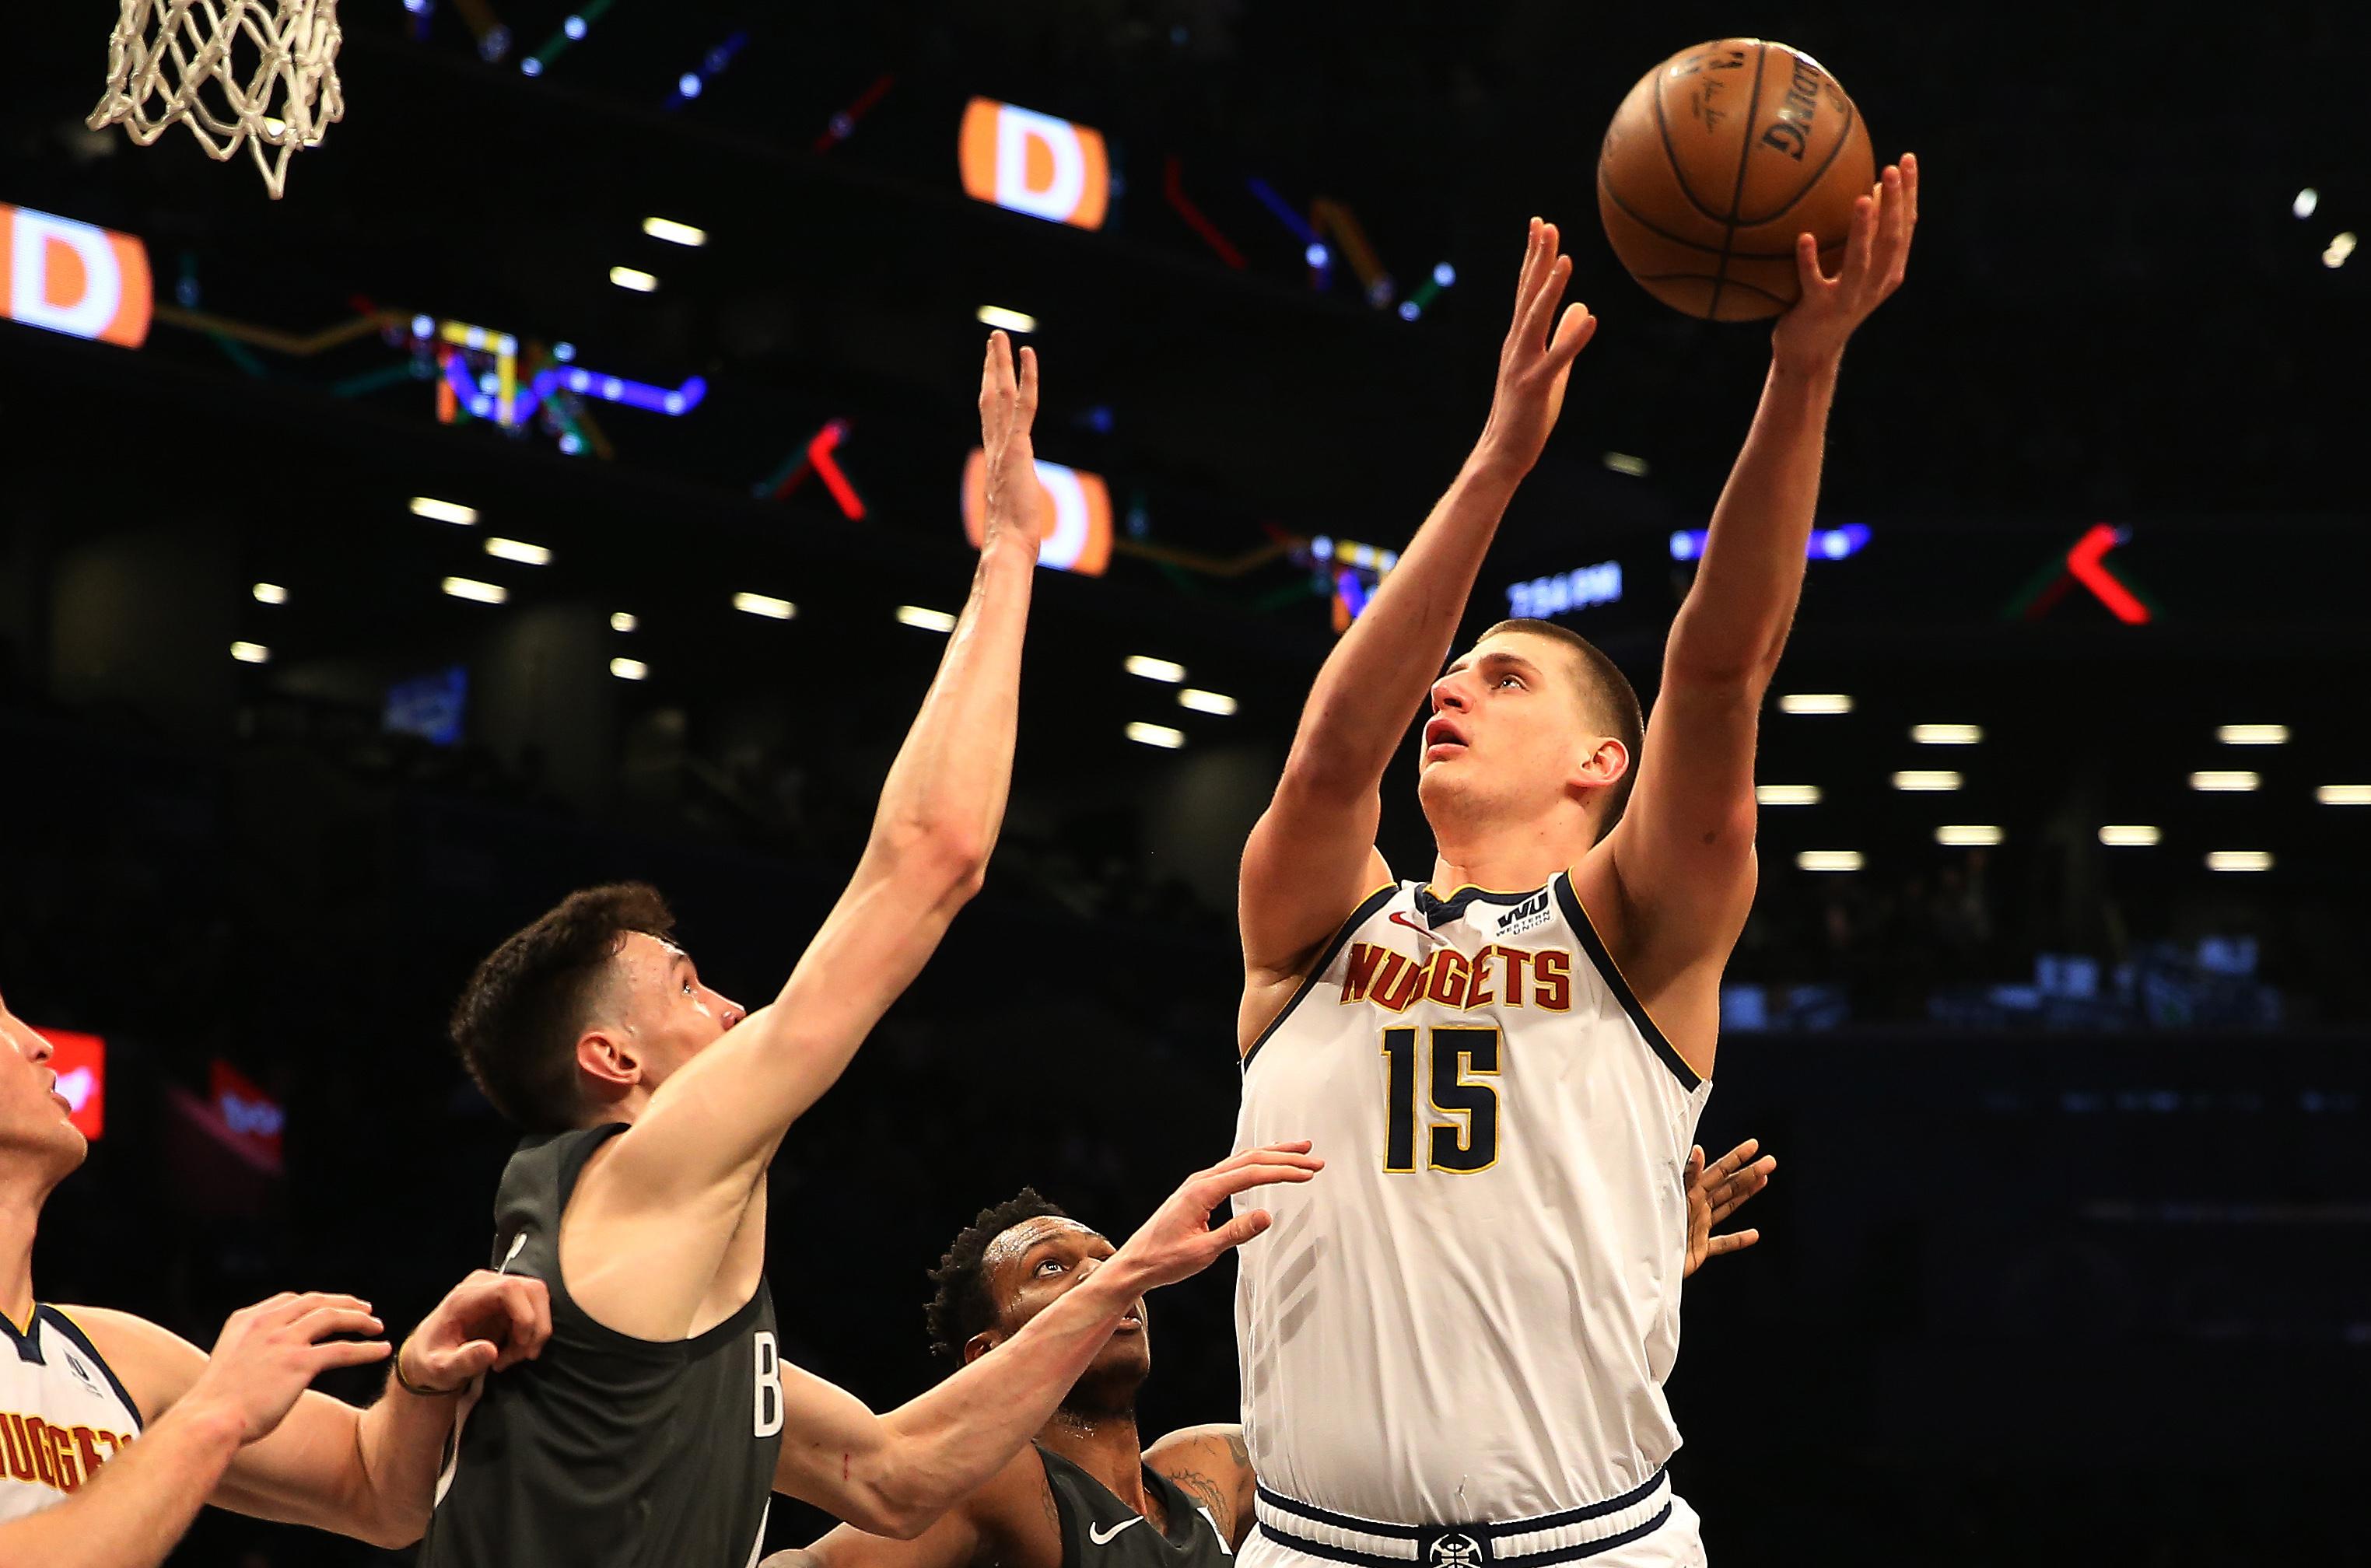 Denver Nuggets center Nikola Jokic (15) shoots against Brooklyn Nets forward Rodions Kurucs (00) during the first half at Barclays Center.